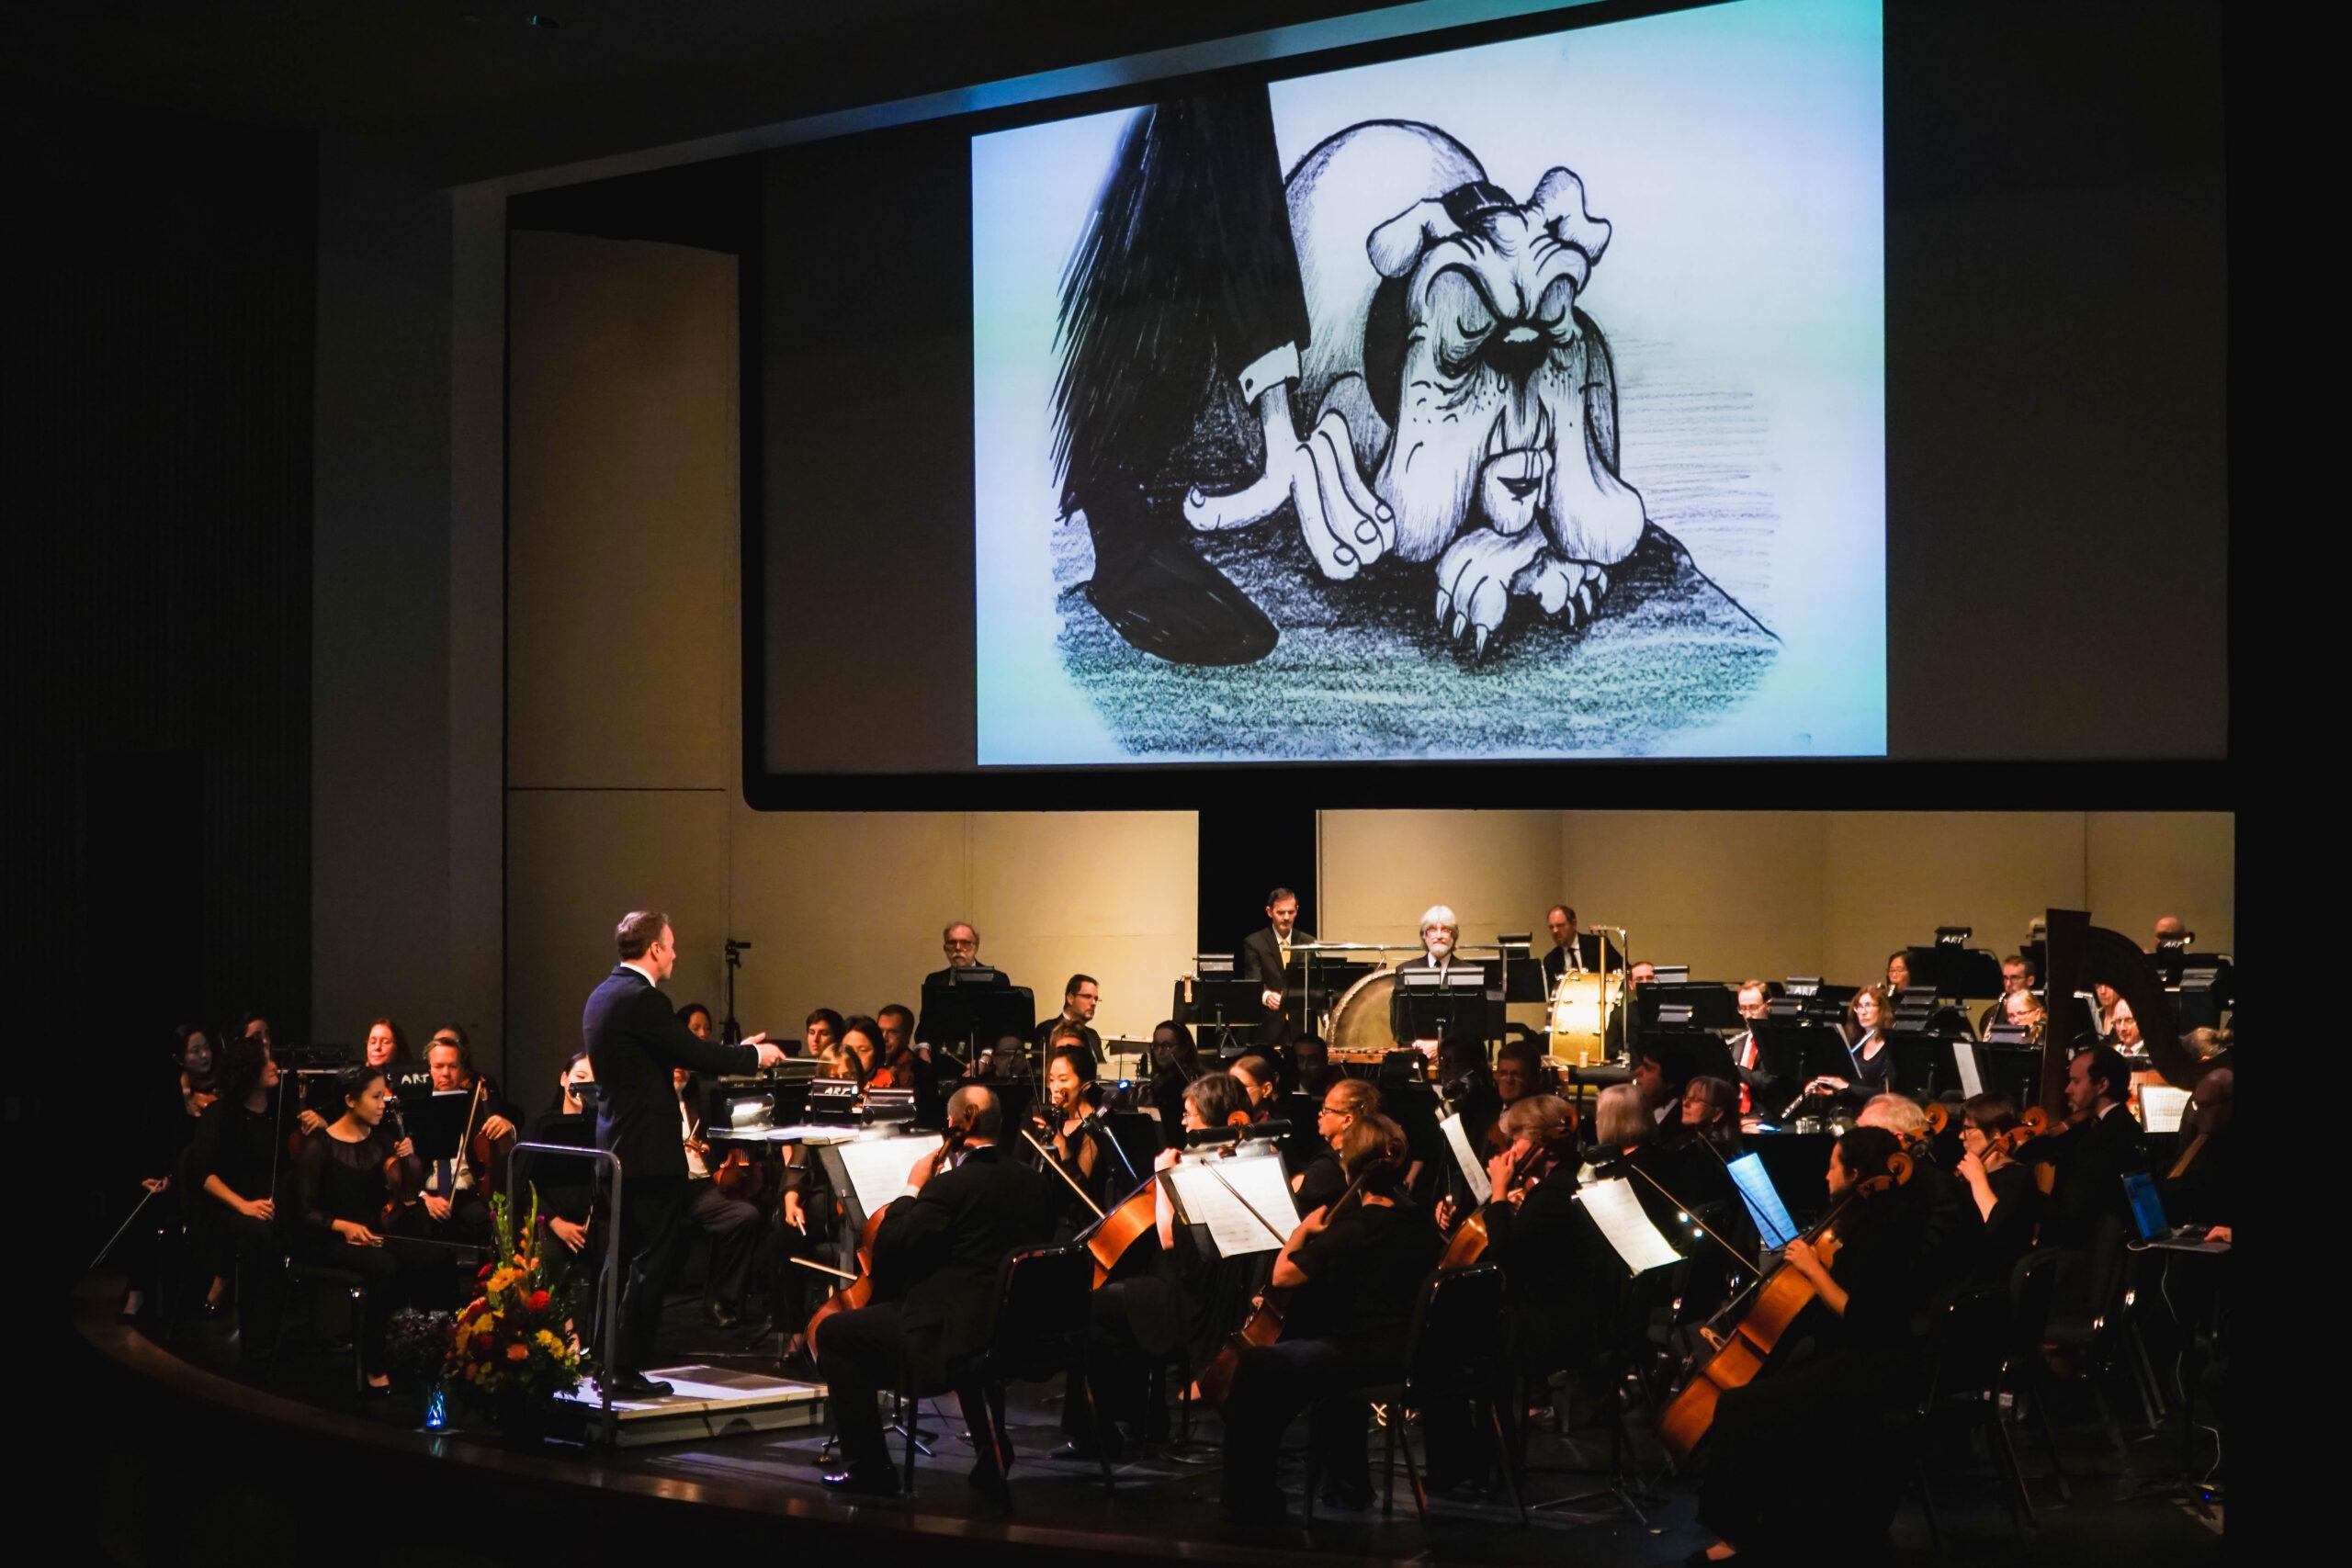 auburn symphony, aso, auburn symphony orchestra, adrian wyard, gnome